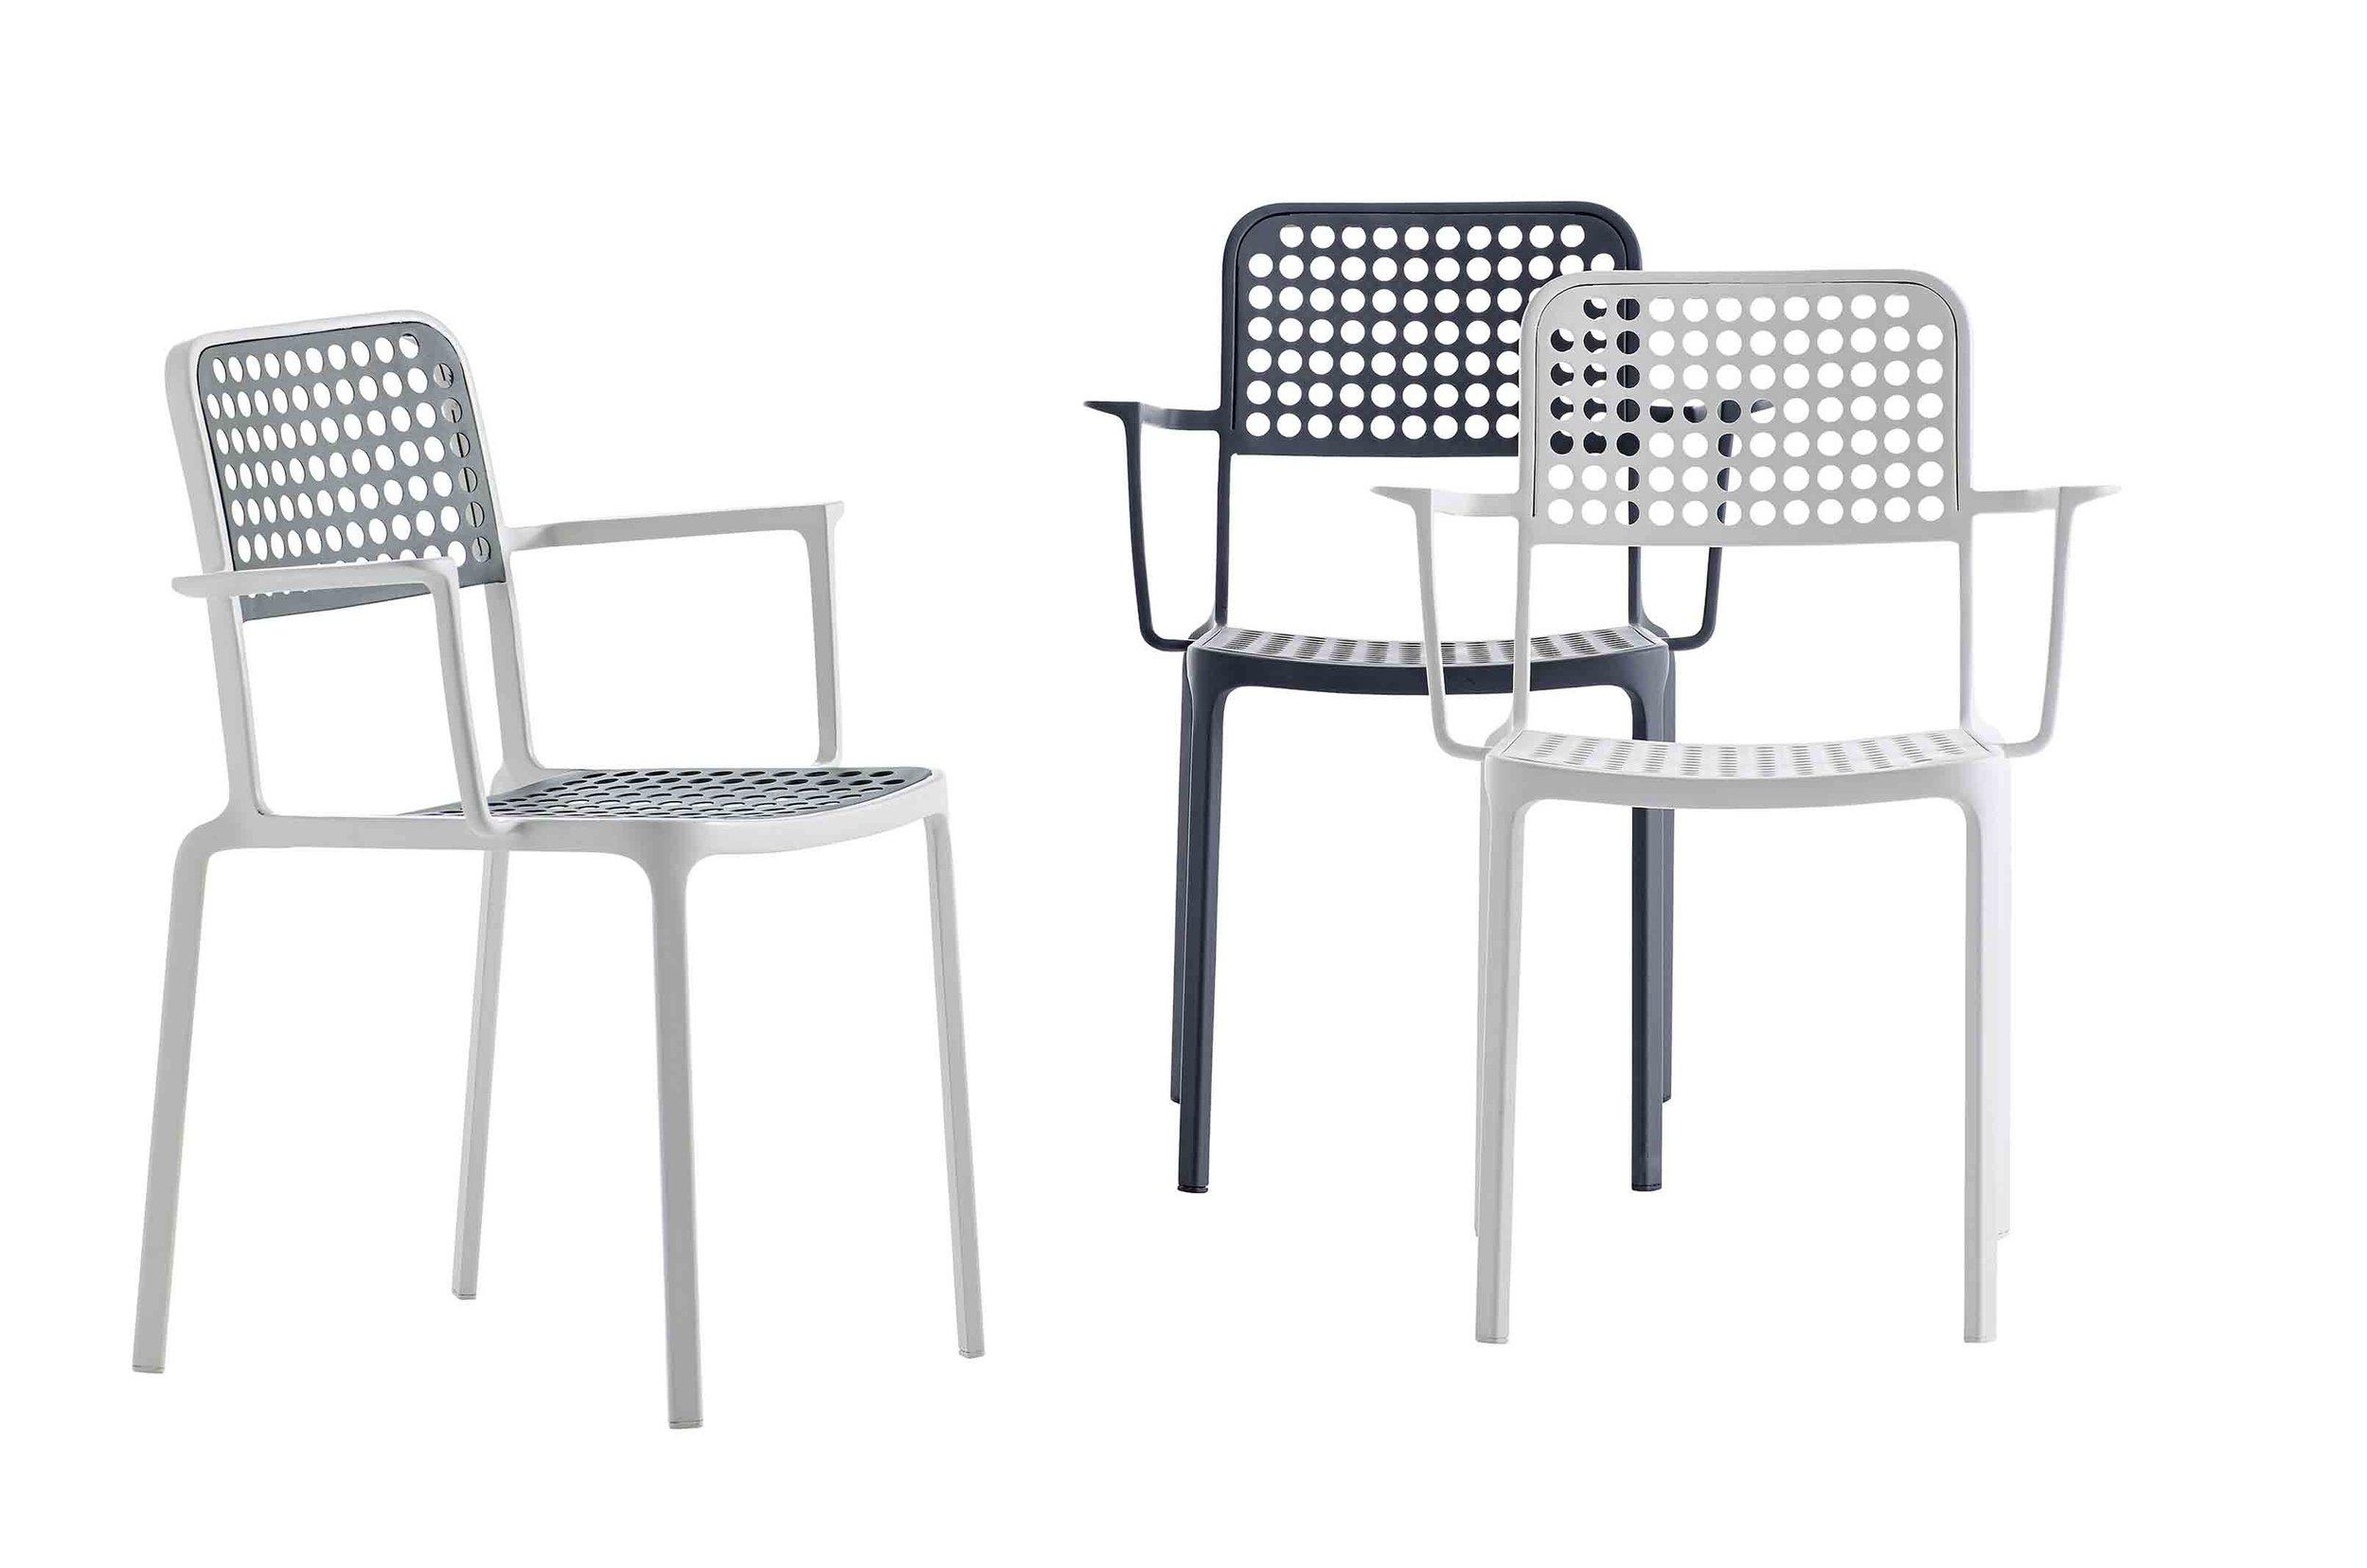 lausanne-chair-atelier-pfister-adrien-rovero-studio-1.jpg